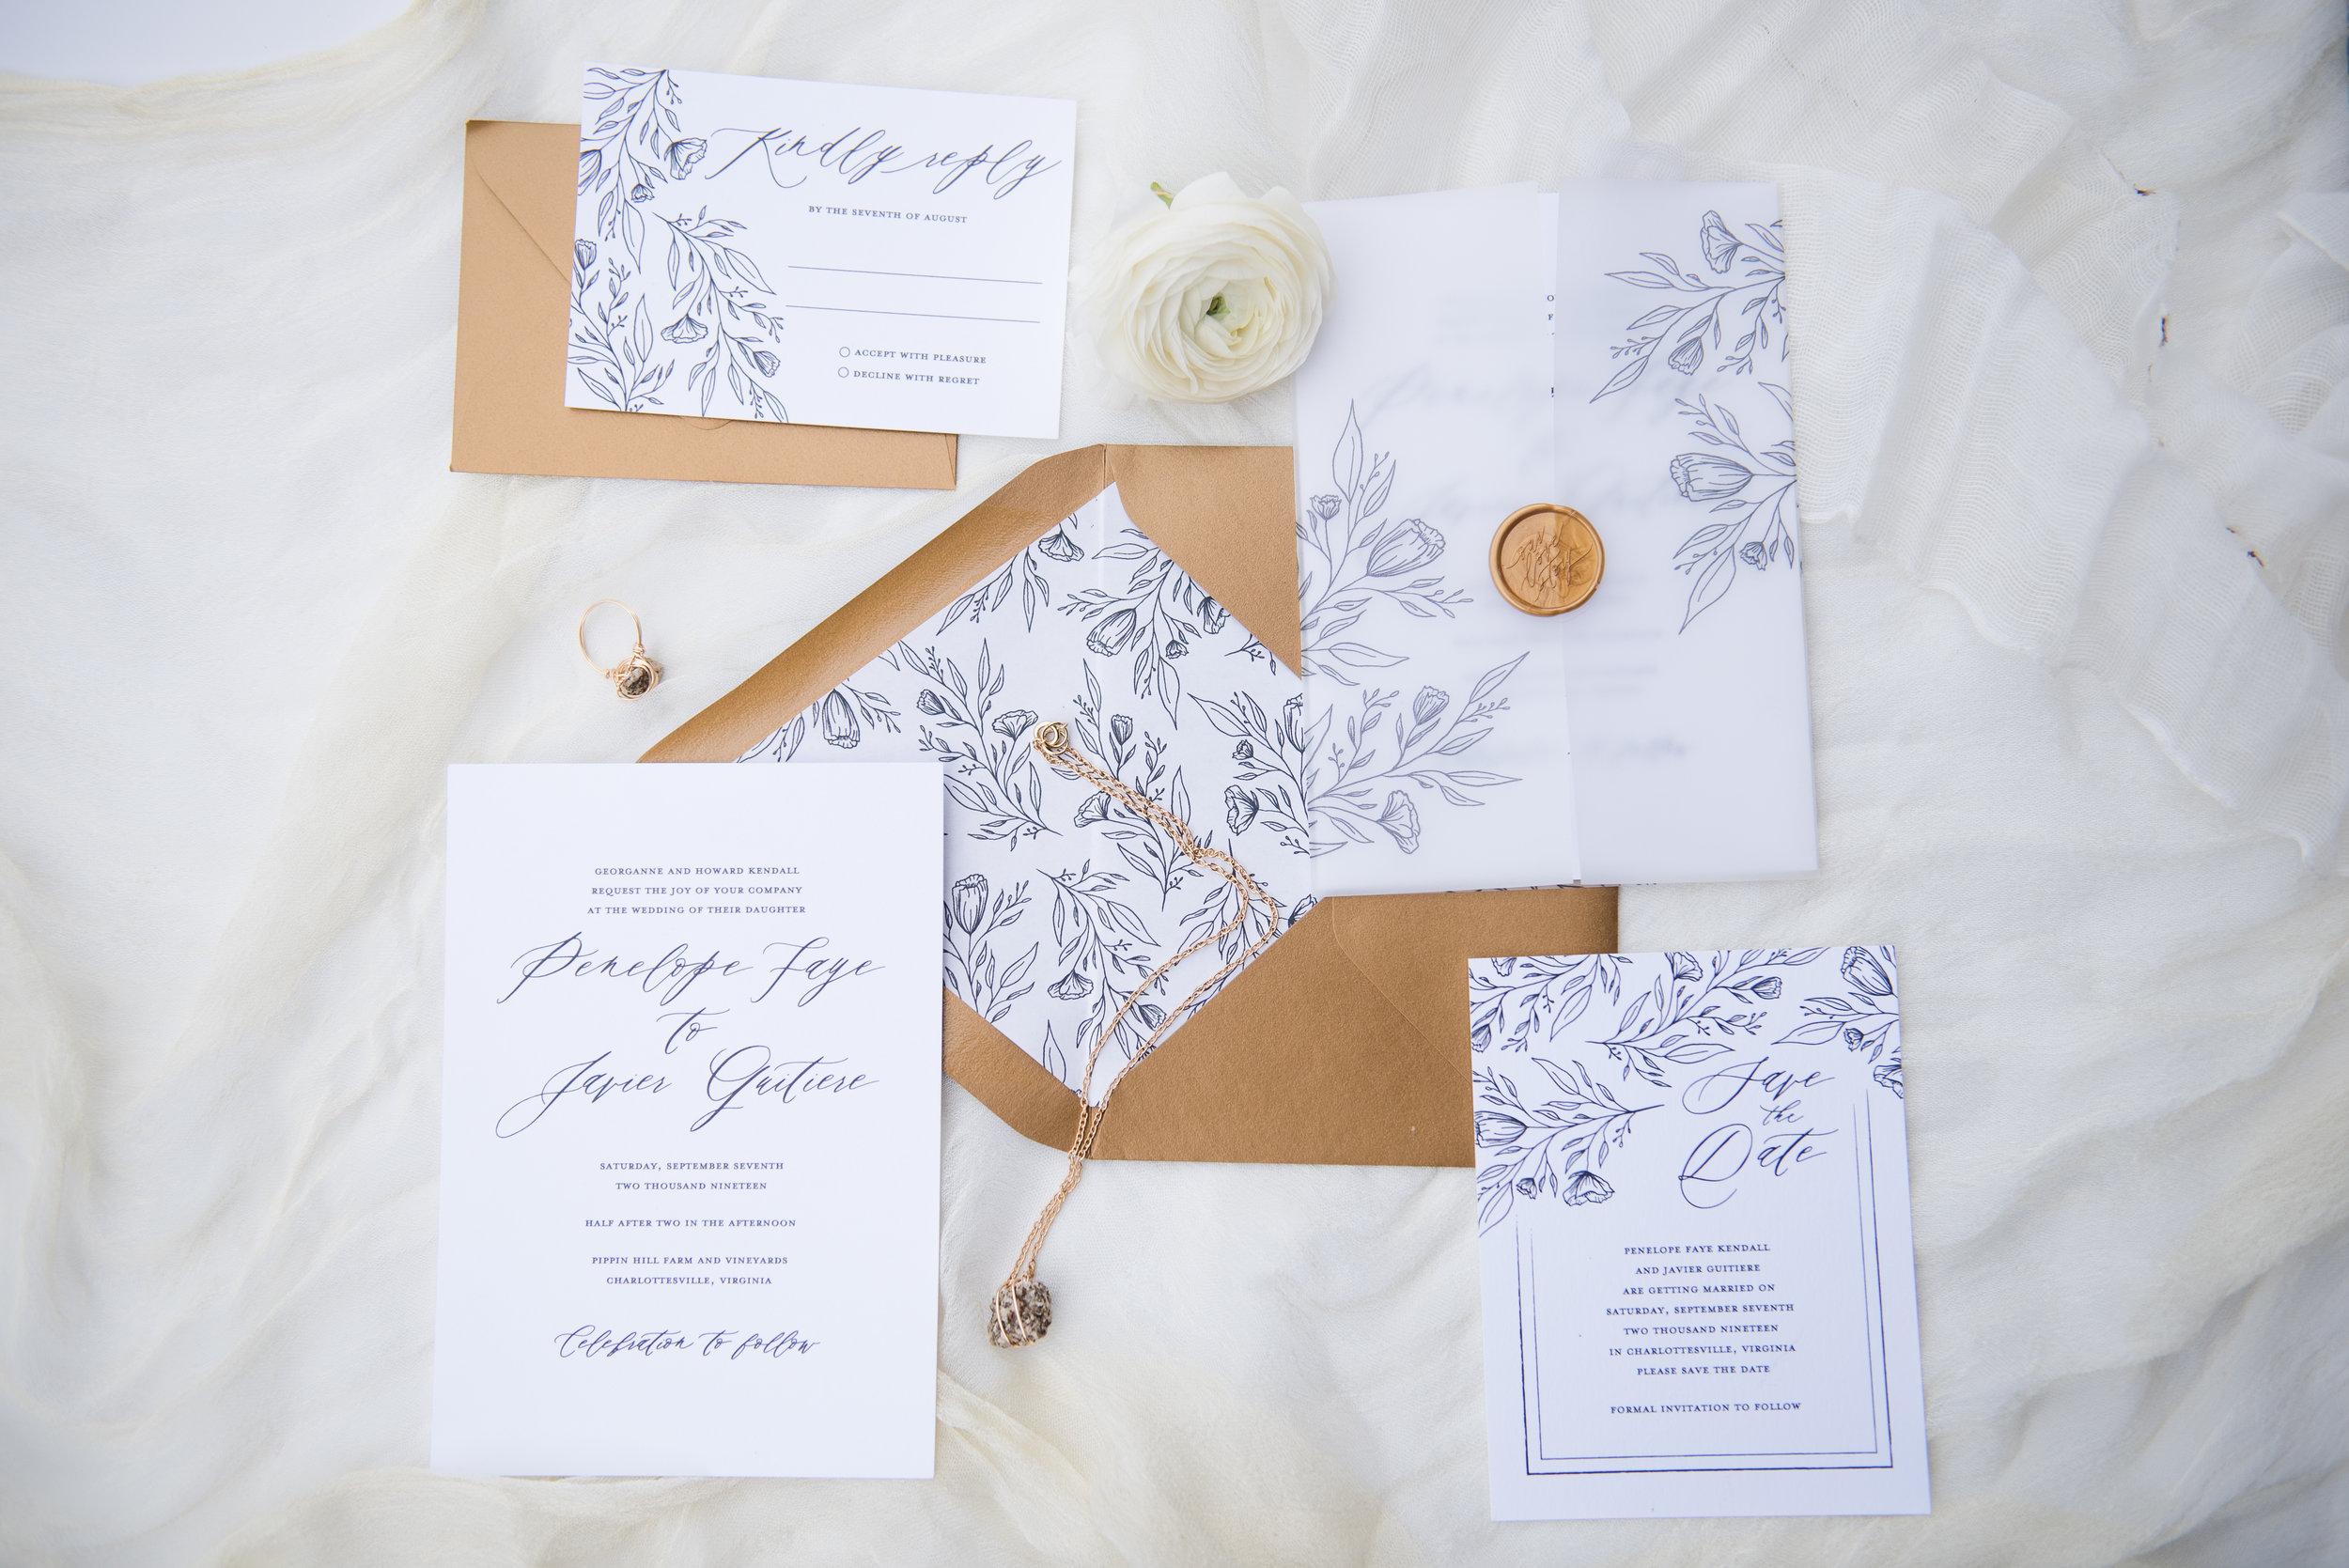 Penelope Hand Drawn Floral Wedding Invitation Feathered Heart PrintsKaeda & Michael (3 of 58).jpg